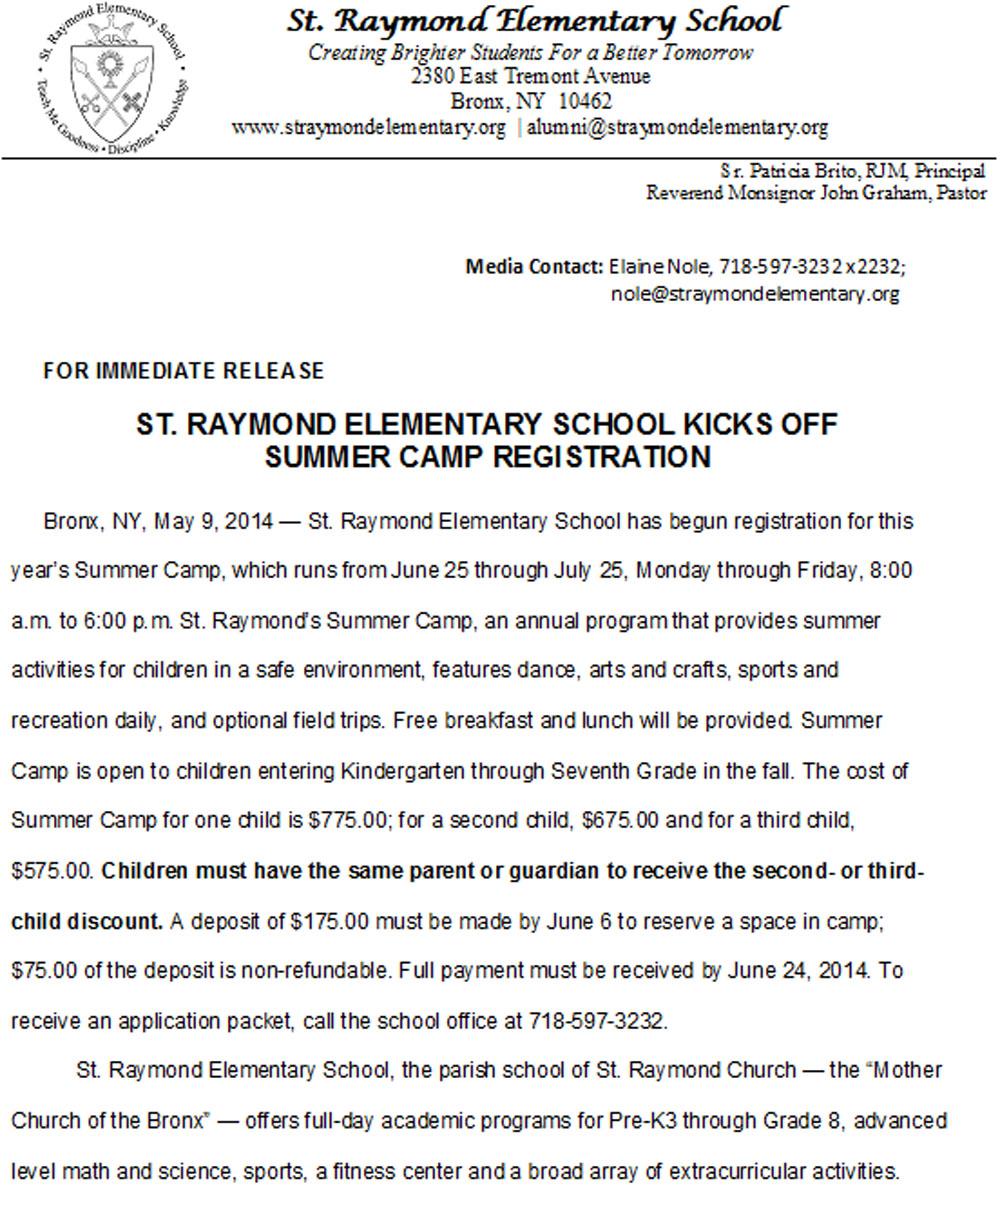 Summer Camp Registration Open for St. Raymond Elementary